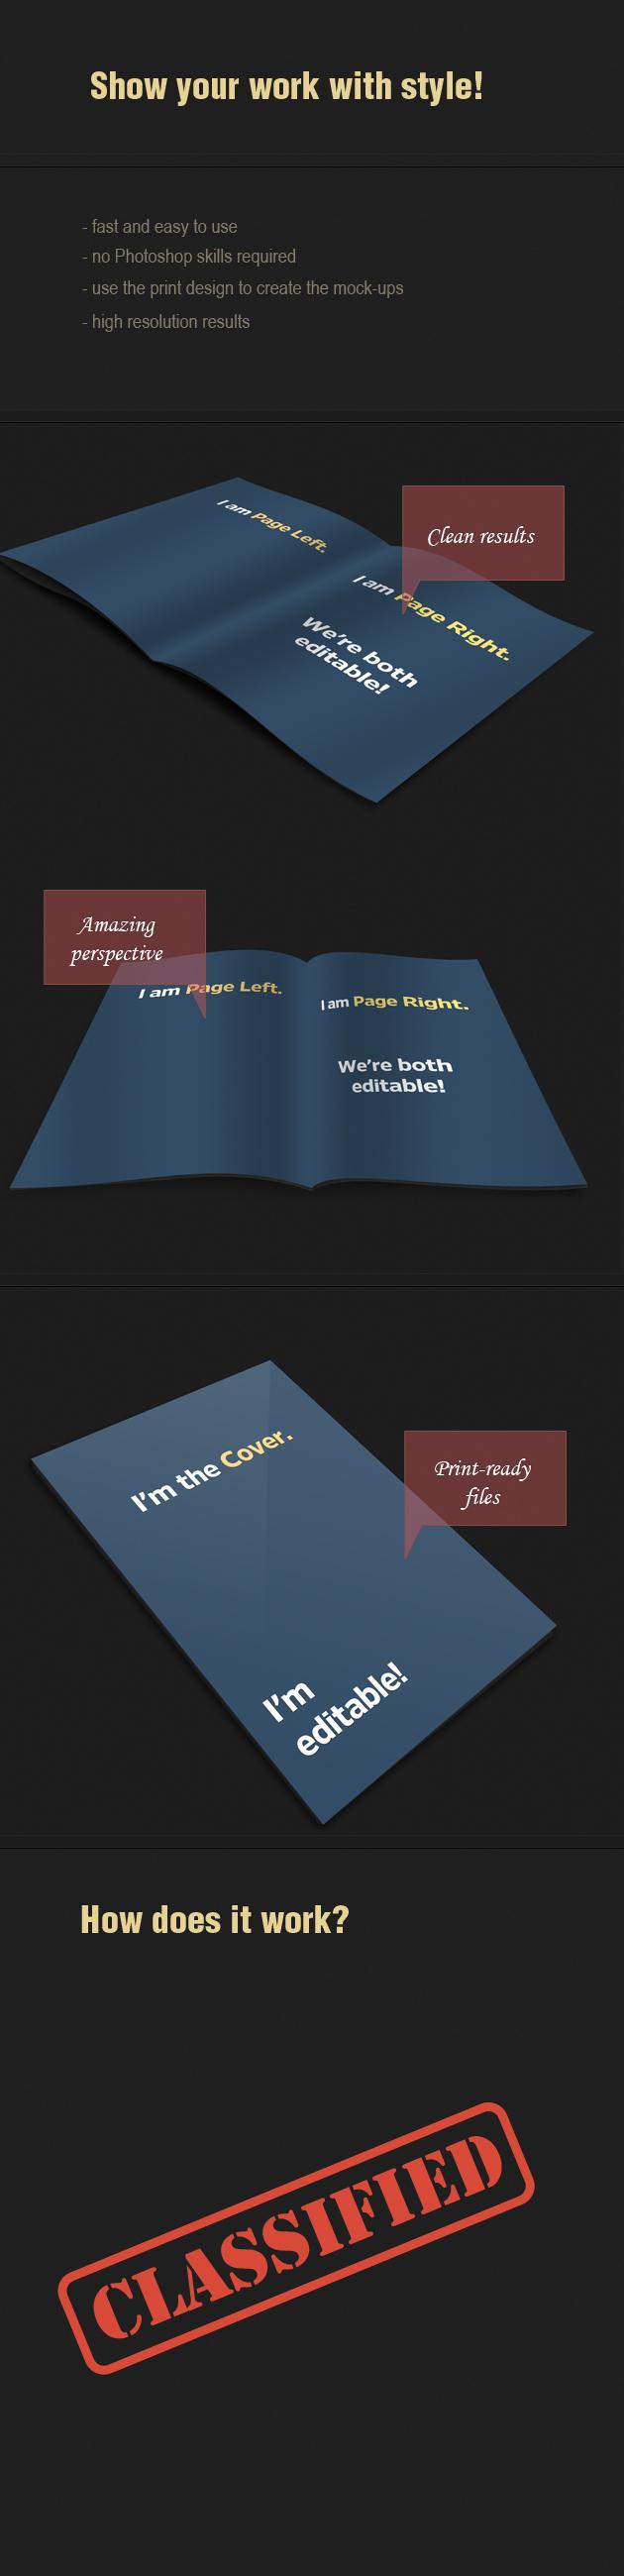 Photo-realistic-Magazine-PS-Mock-ups designtnt addon magazine mockup template large